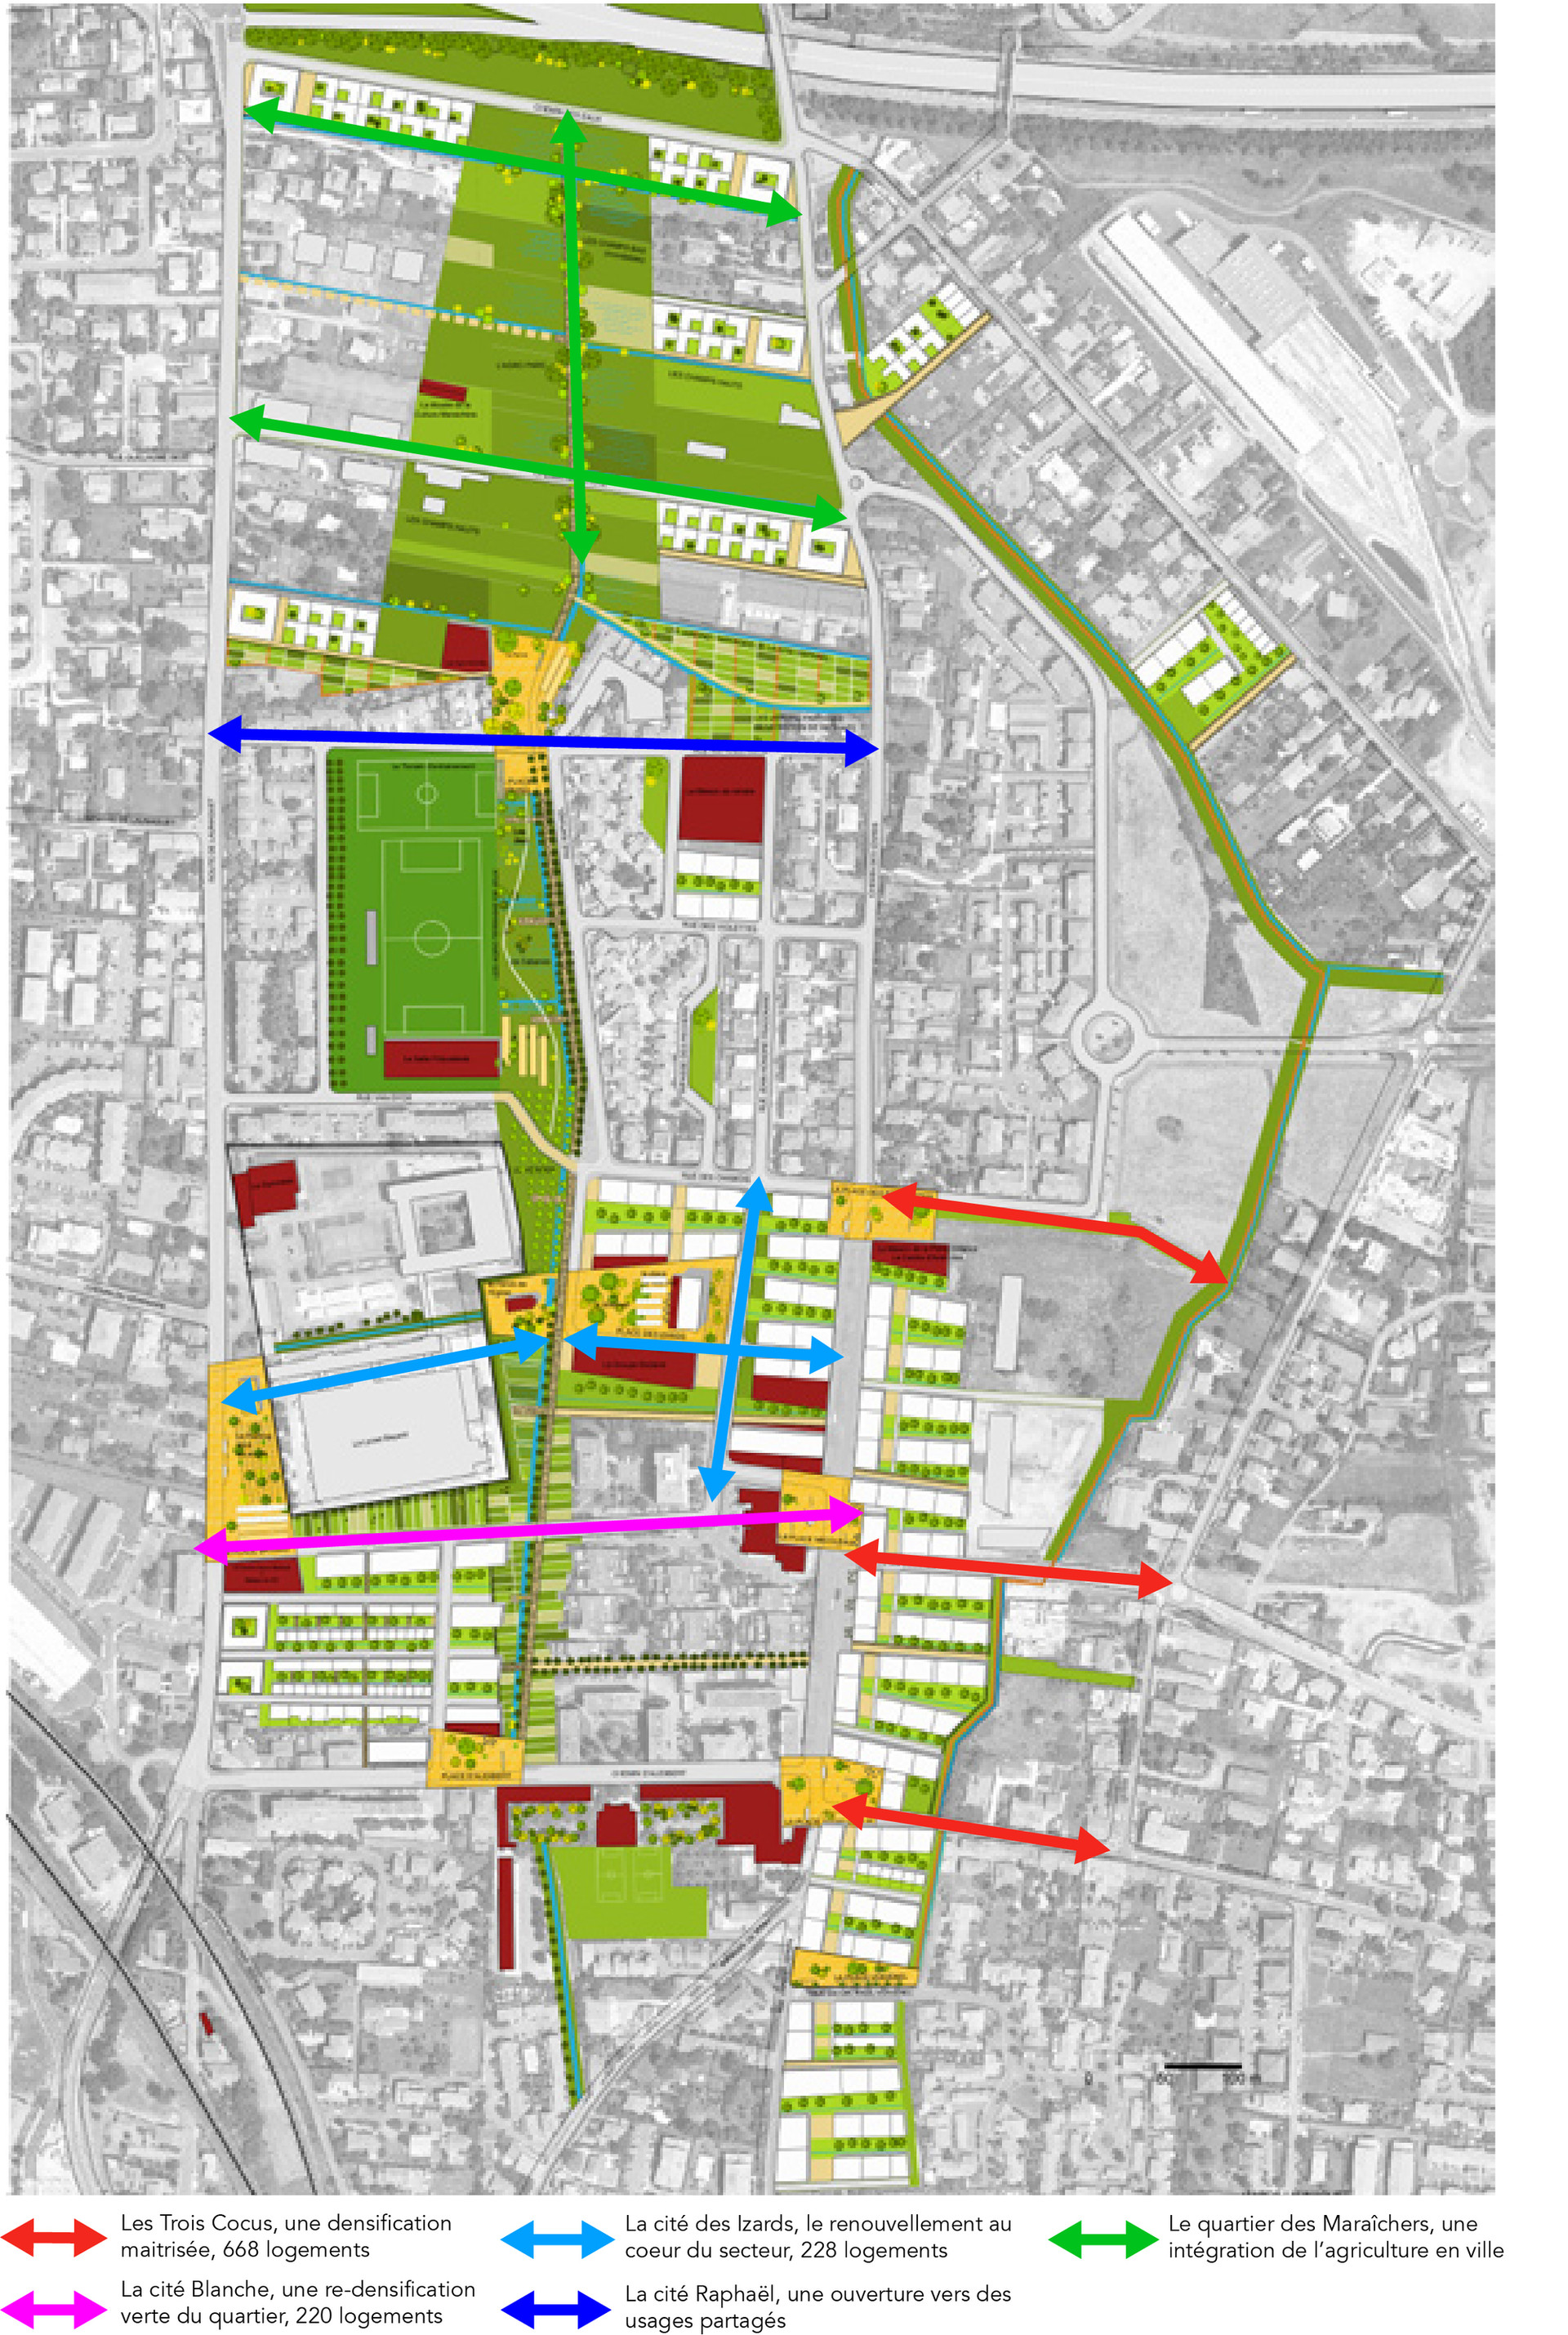 un objectif de densification de l'espace urbain